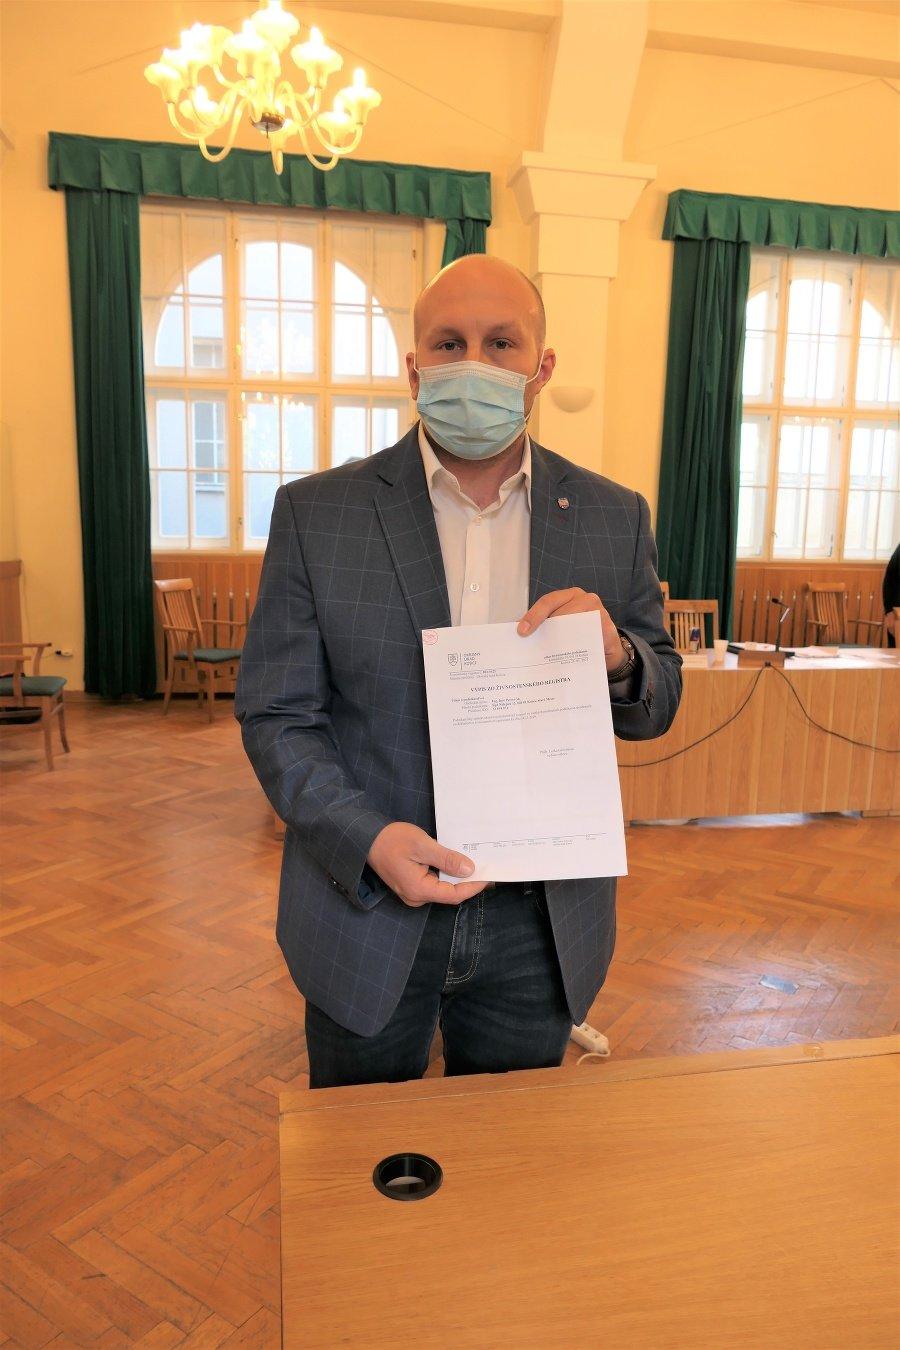 Podnet na starostu podal poslanec Djordjevič ešte na májovom zastupiteľstve.